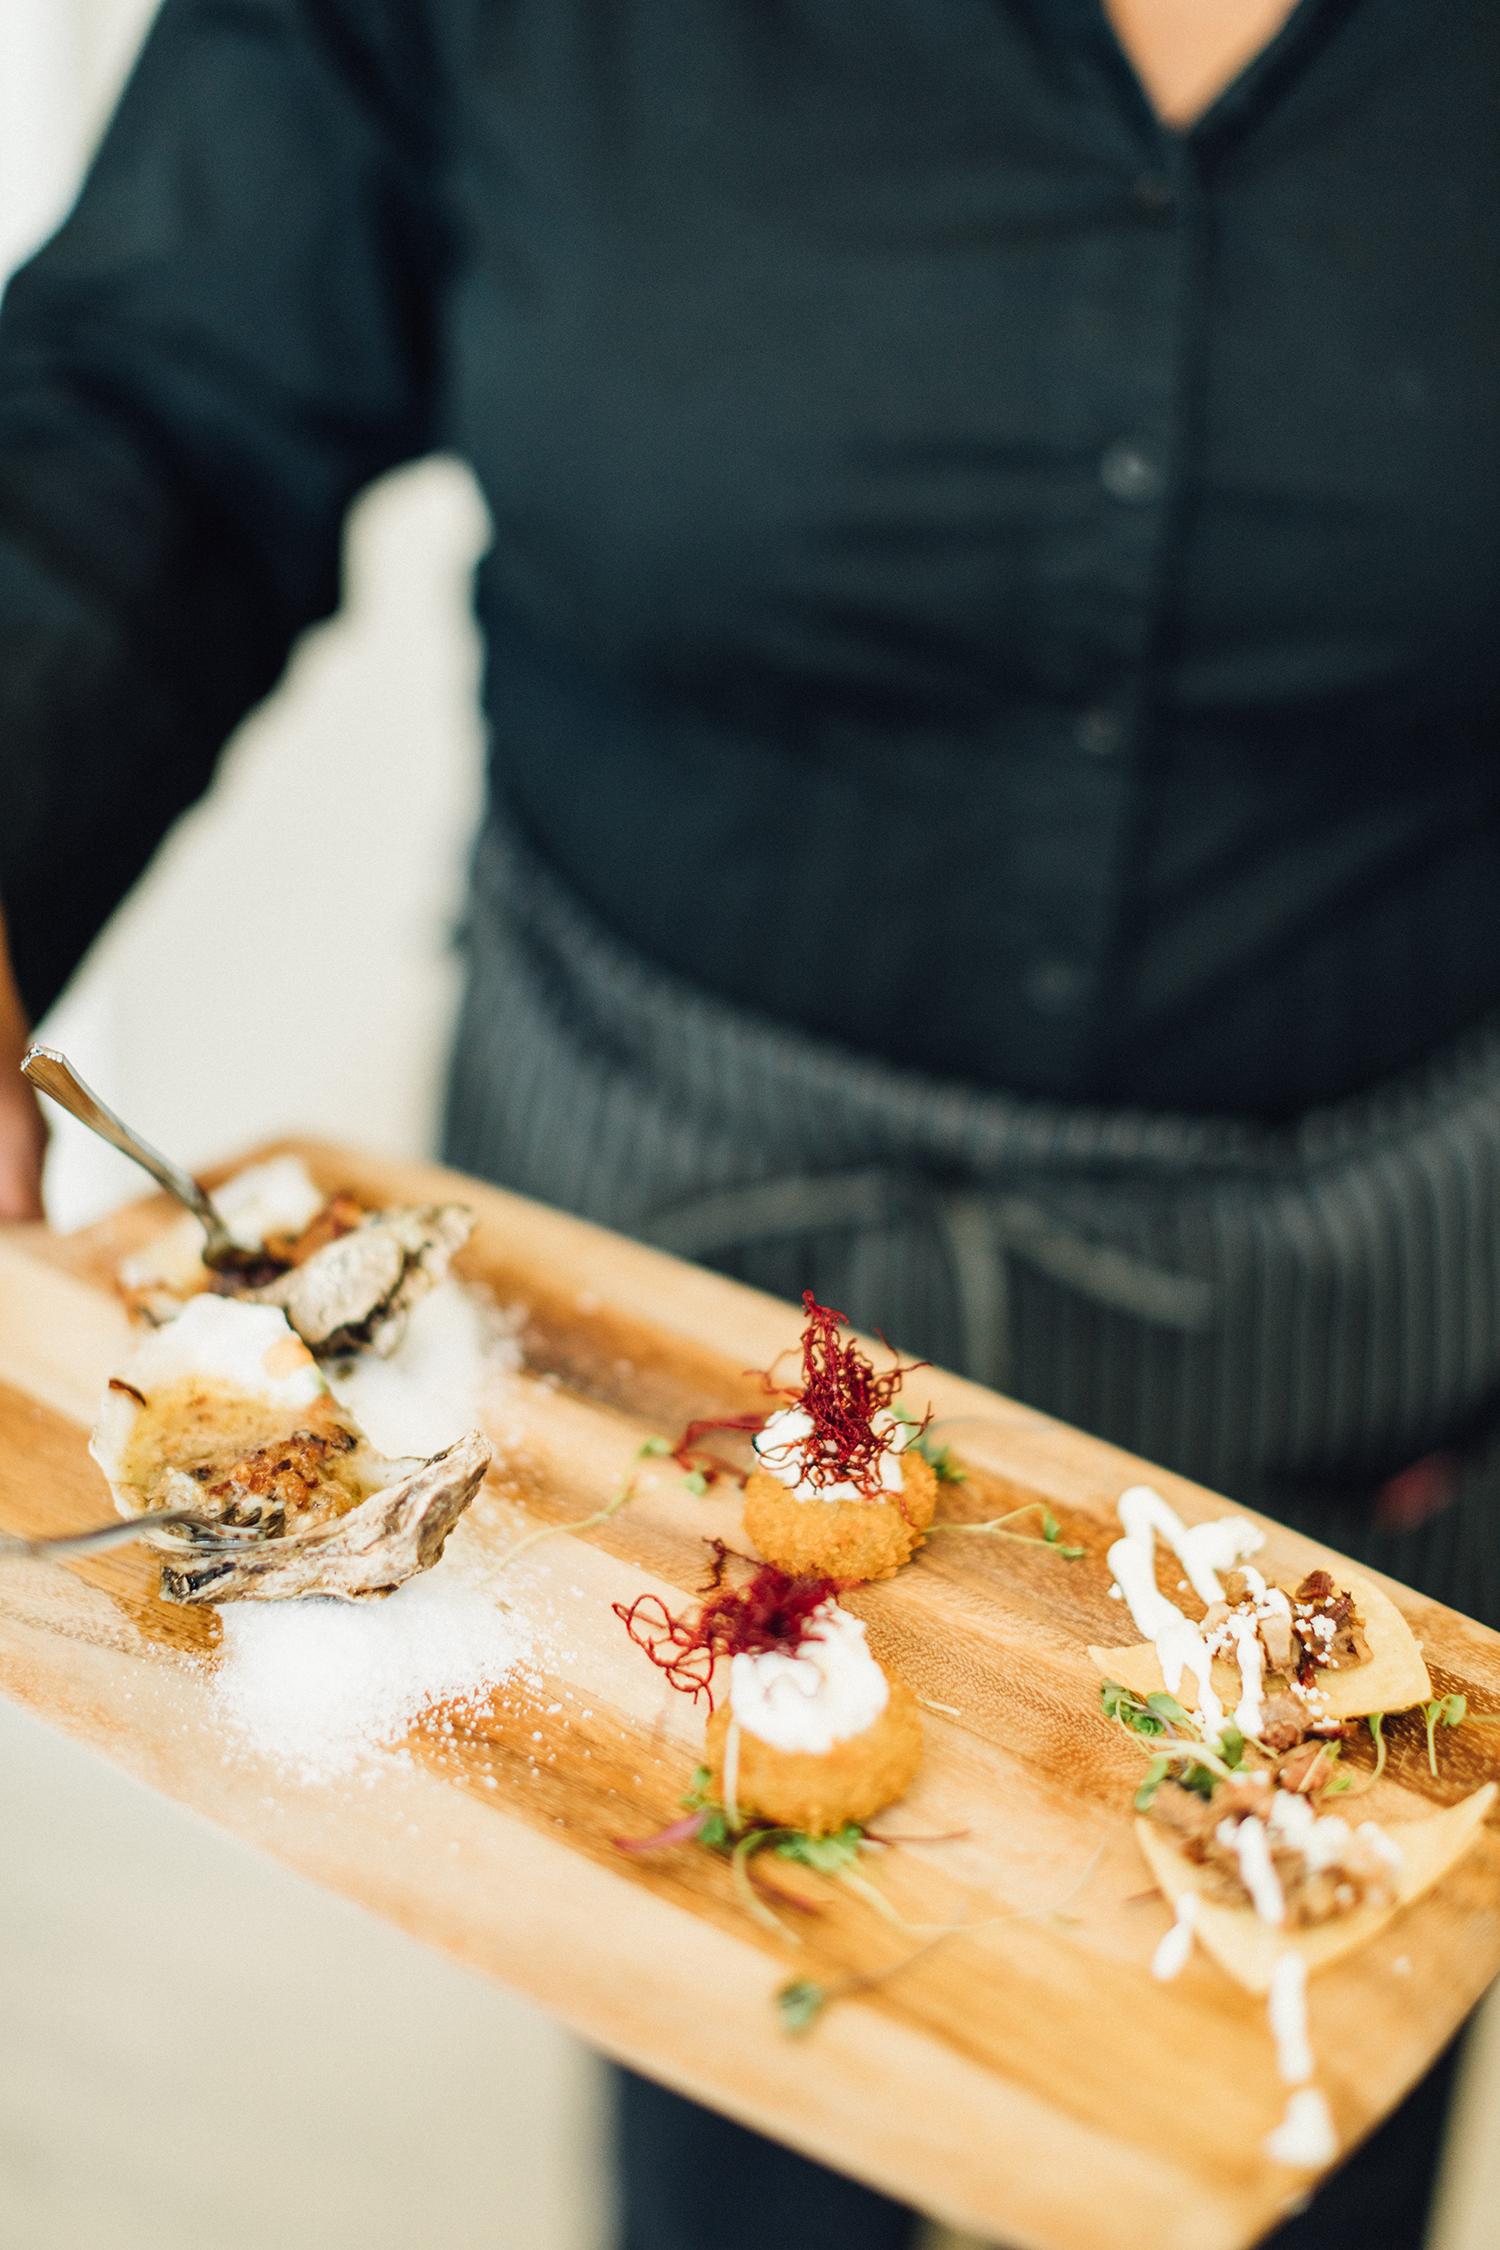 amanda chuck wedding appetizers on wooden tray